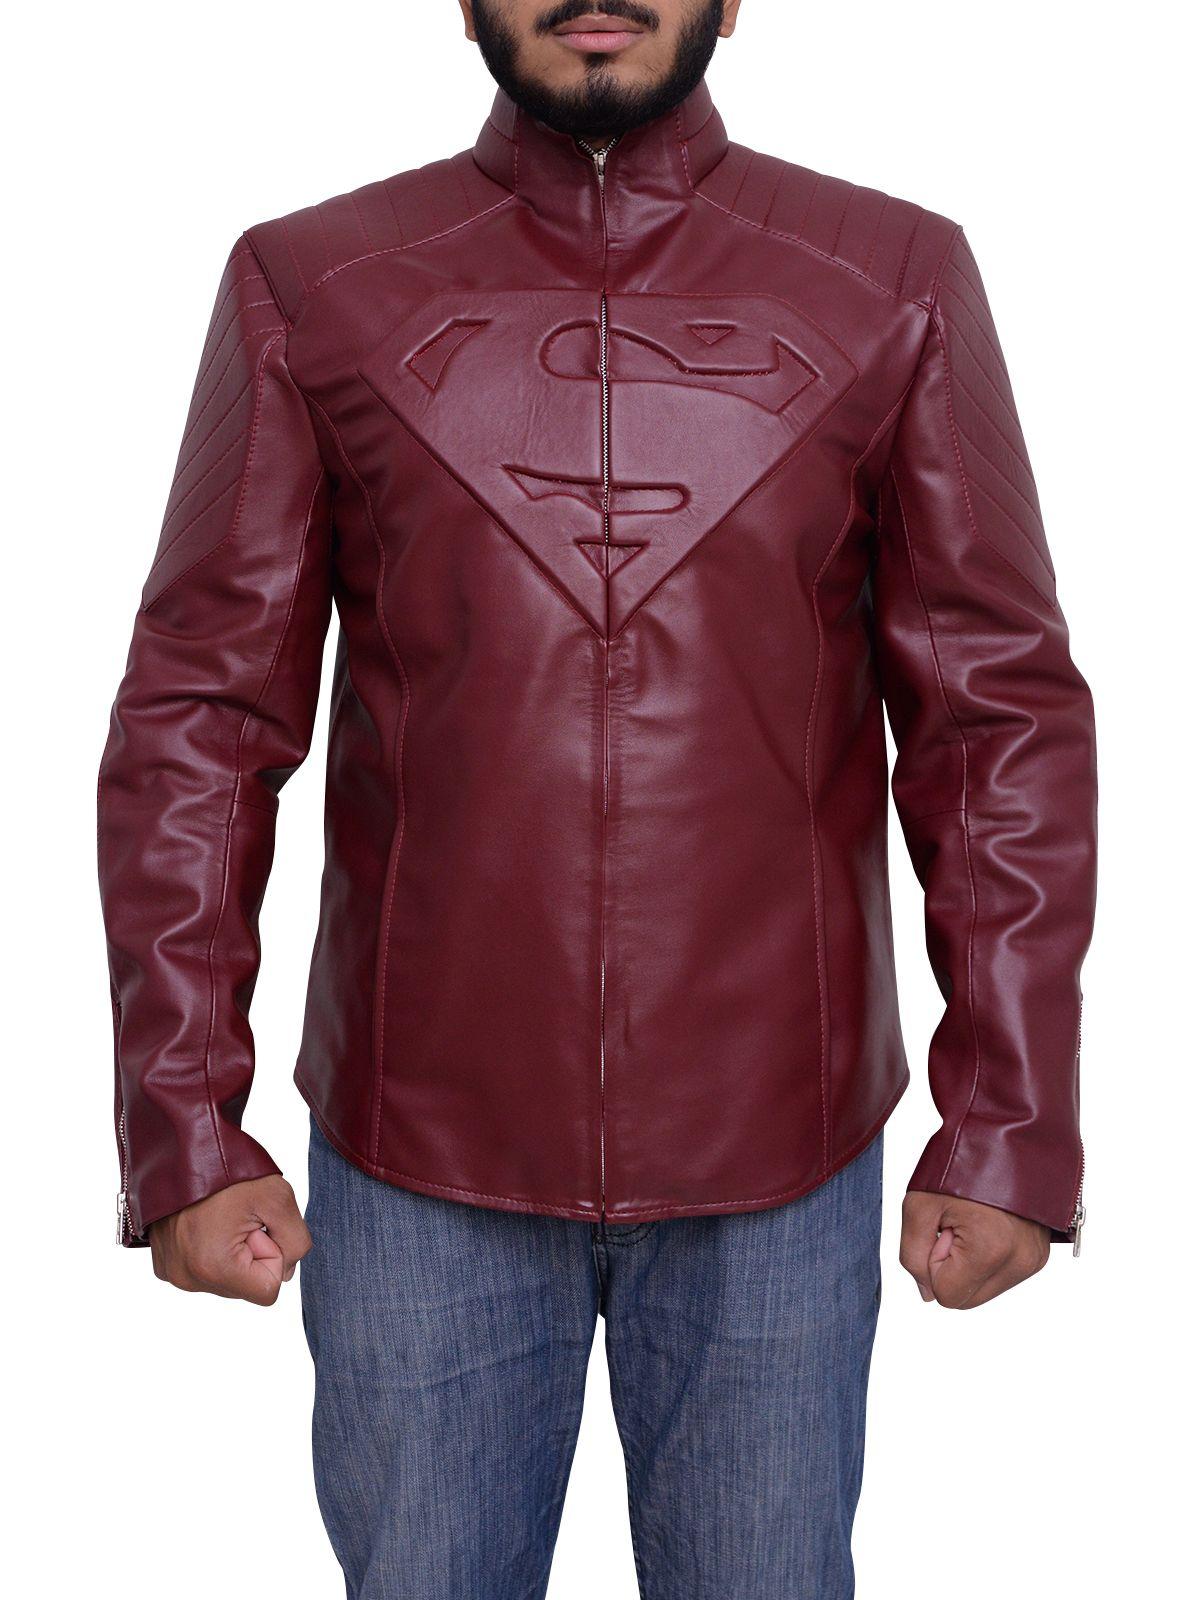 Superman Smallville Red Jacket Red jacket, Jackets